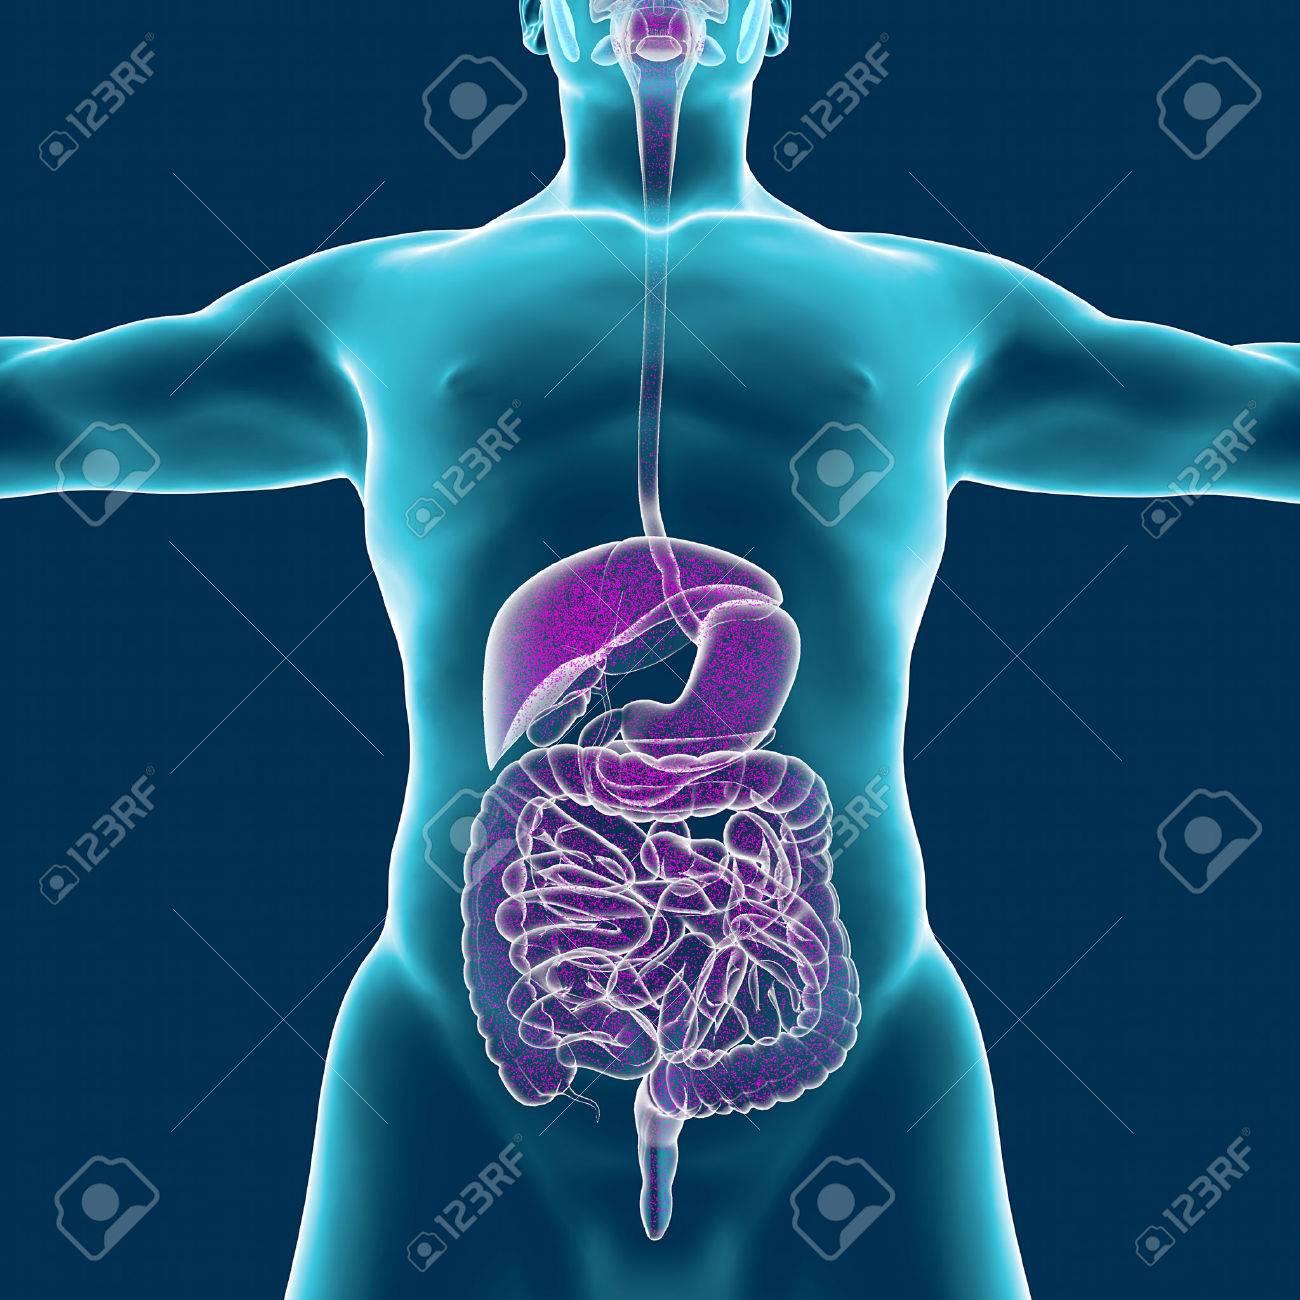 Cuerpo Humano, Sistema Muscular, Persona, Sistema Digestivo ...